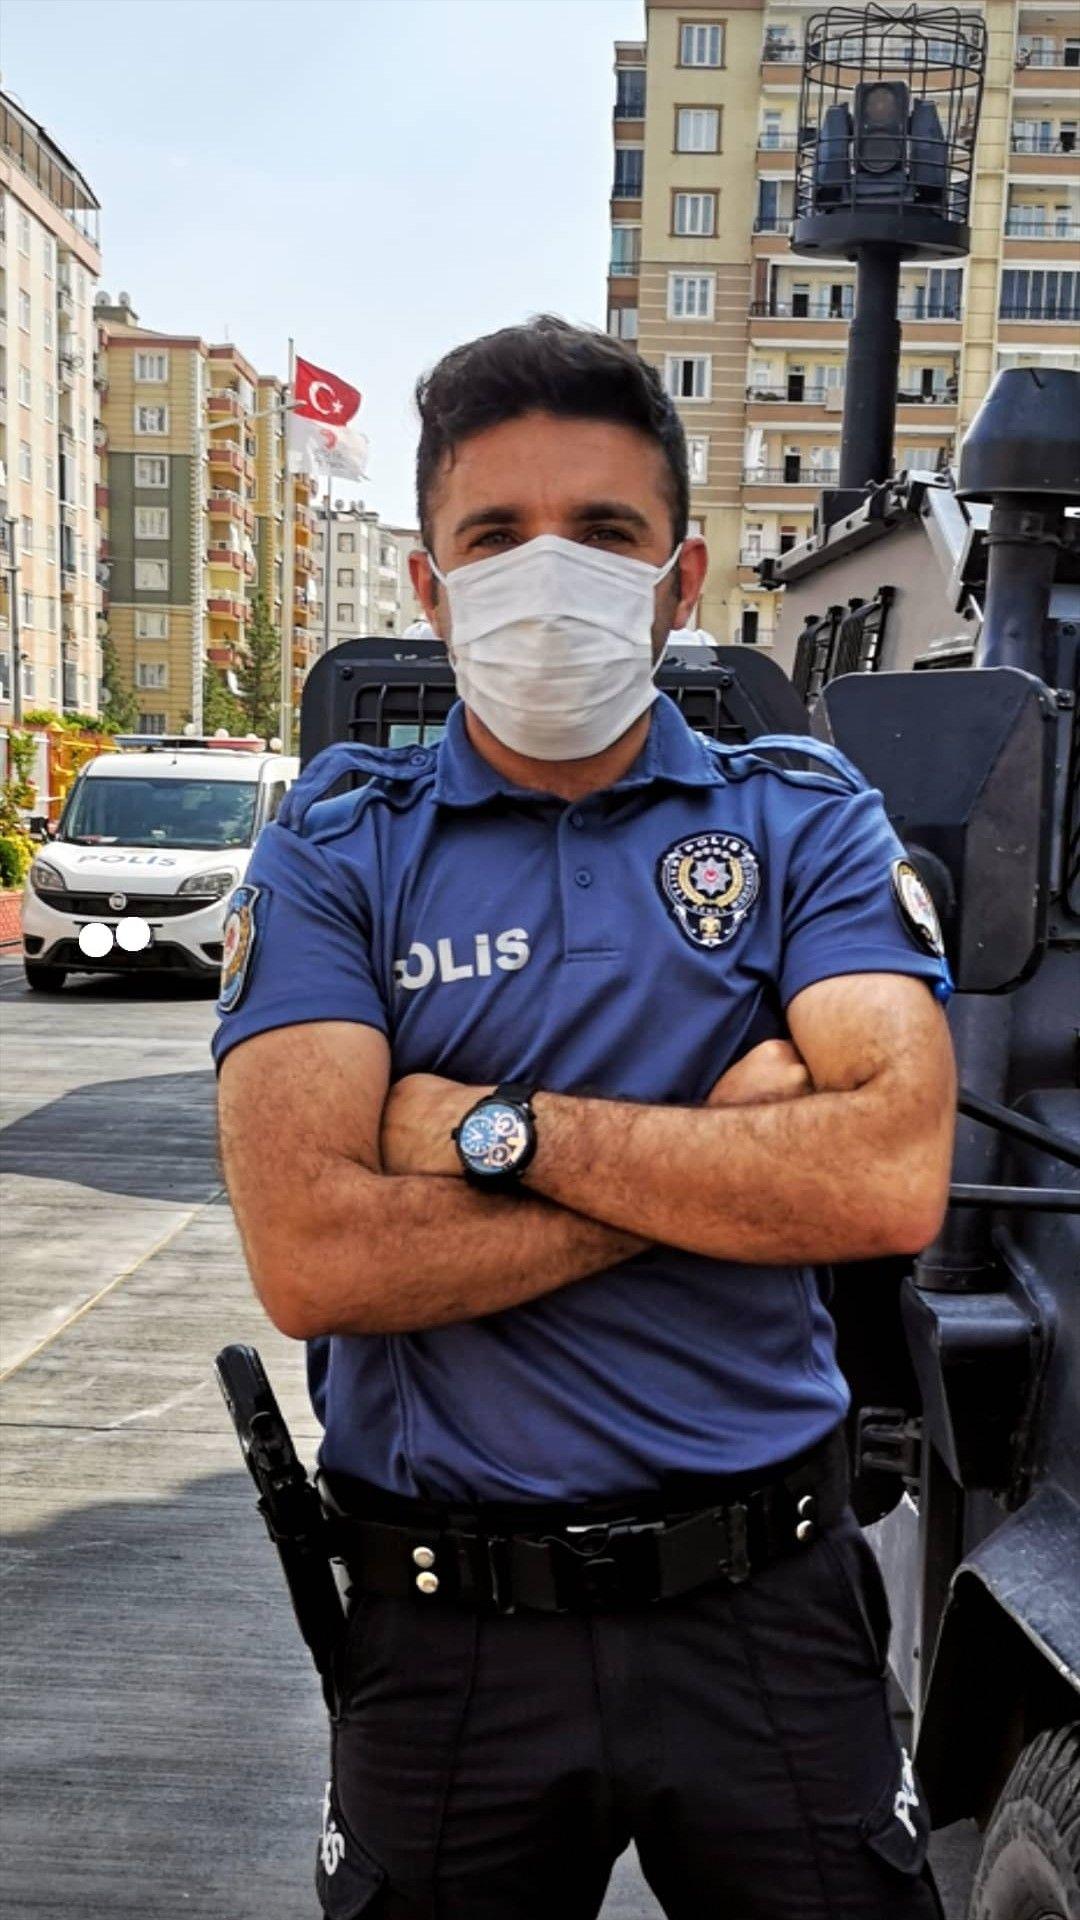 Ozel Kuvvetler Polis Asker Panosundaki Pin